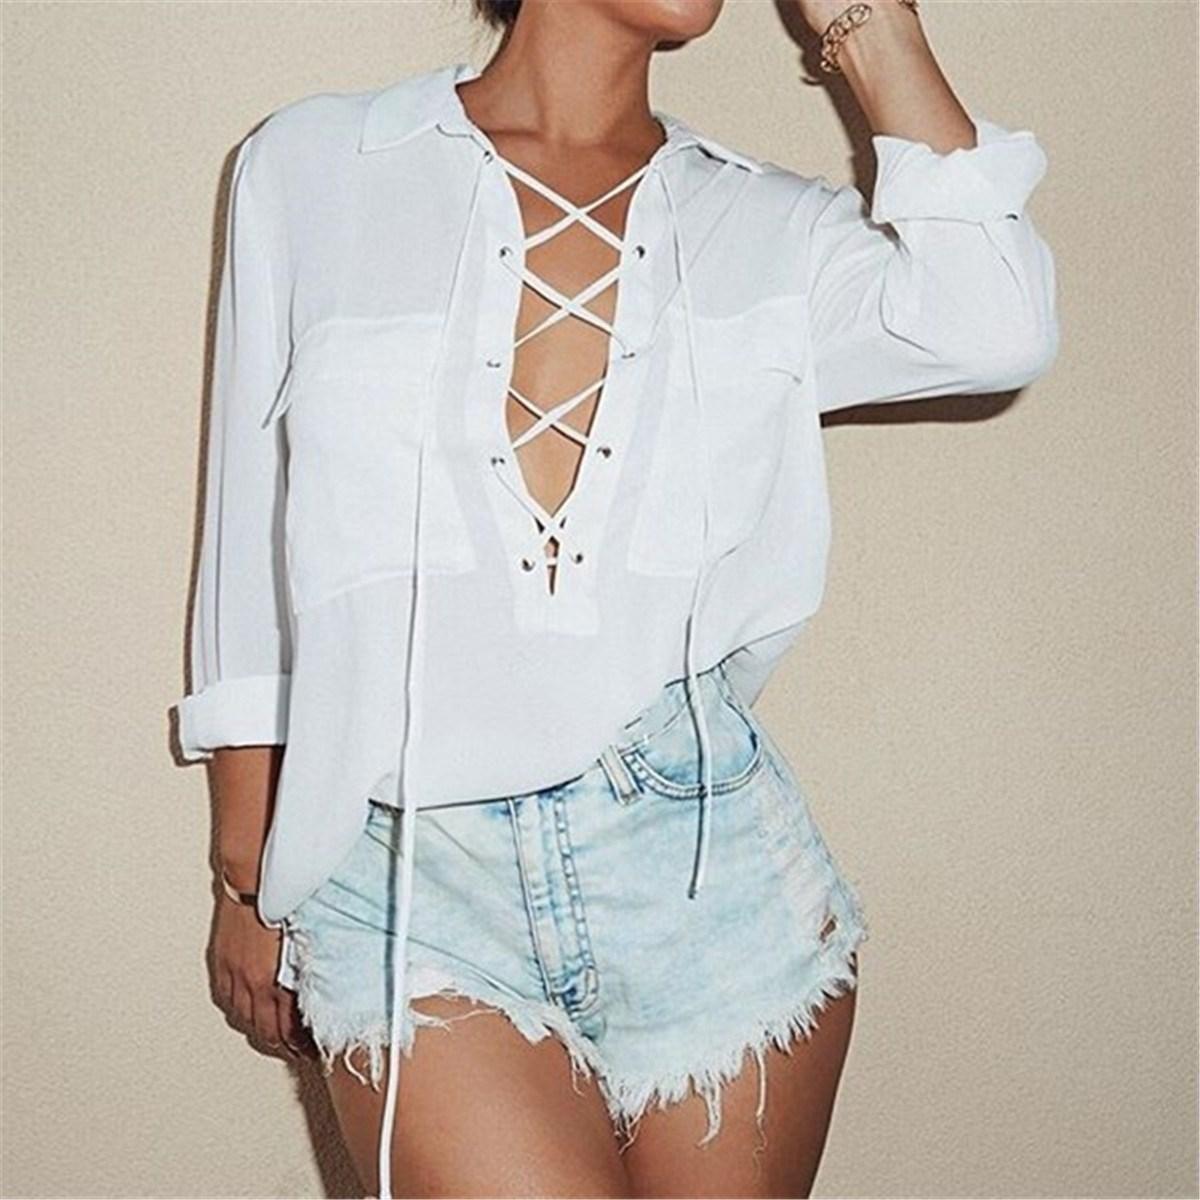 Button down shirt sexy